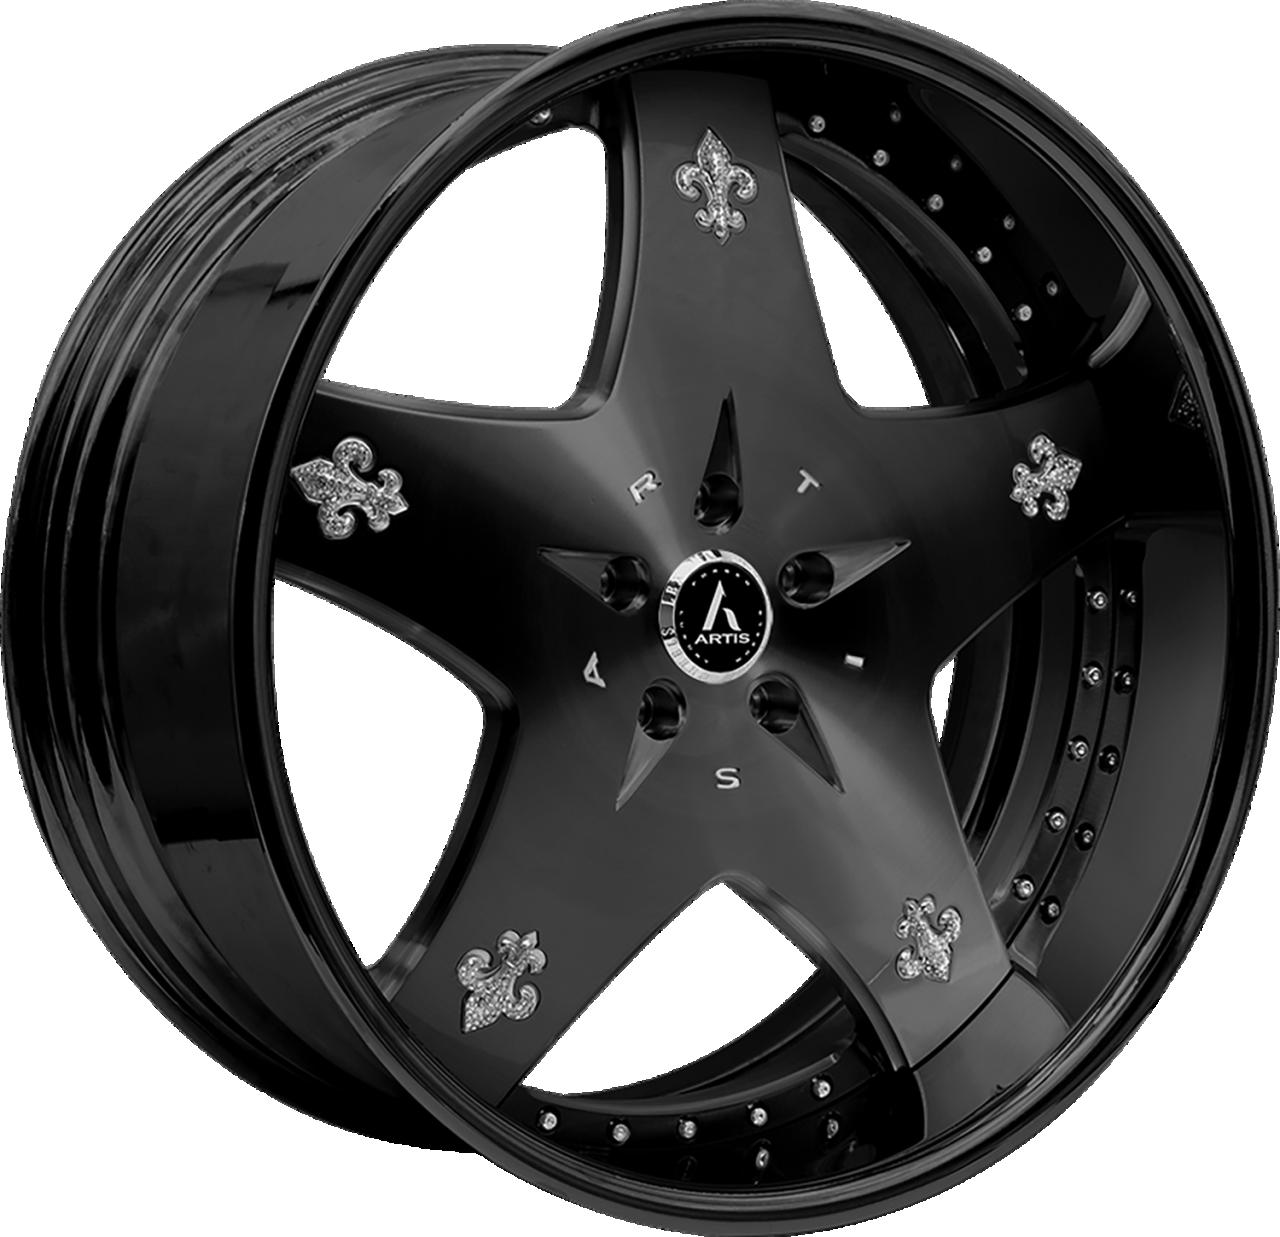 Artis Forged Cashville wheel with Custom Satin Black finish